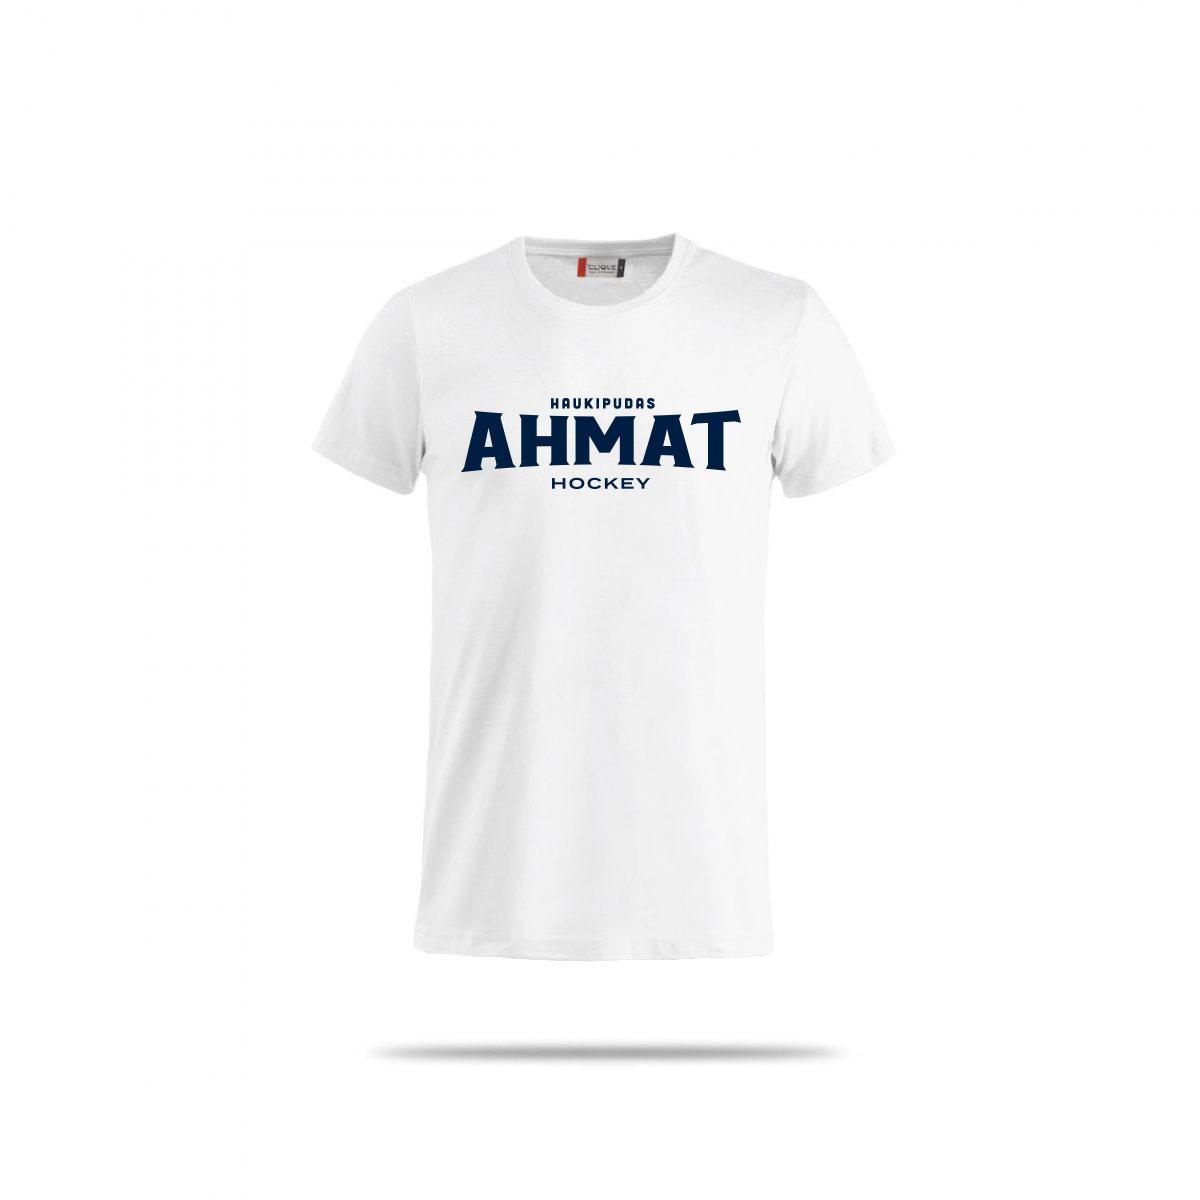 Ahmat-fani-3020-valk-text